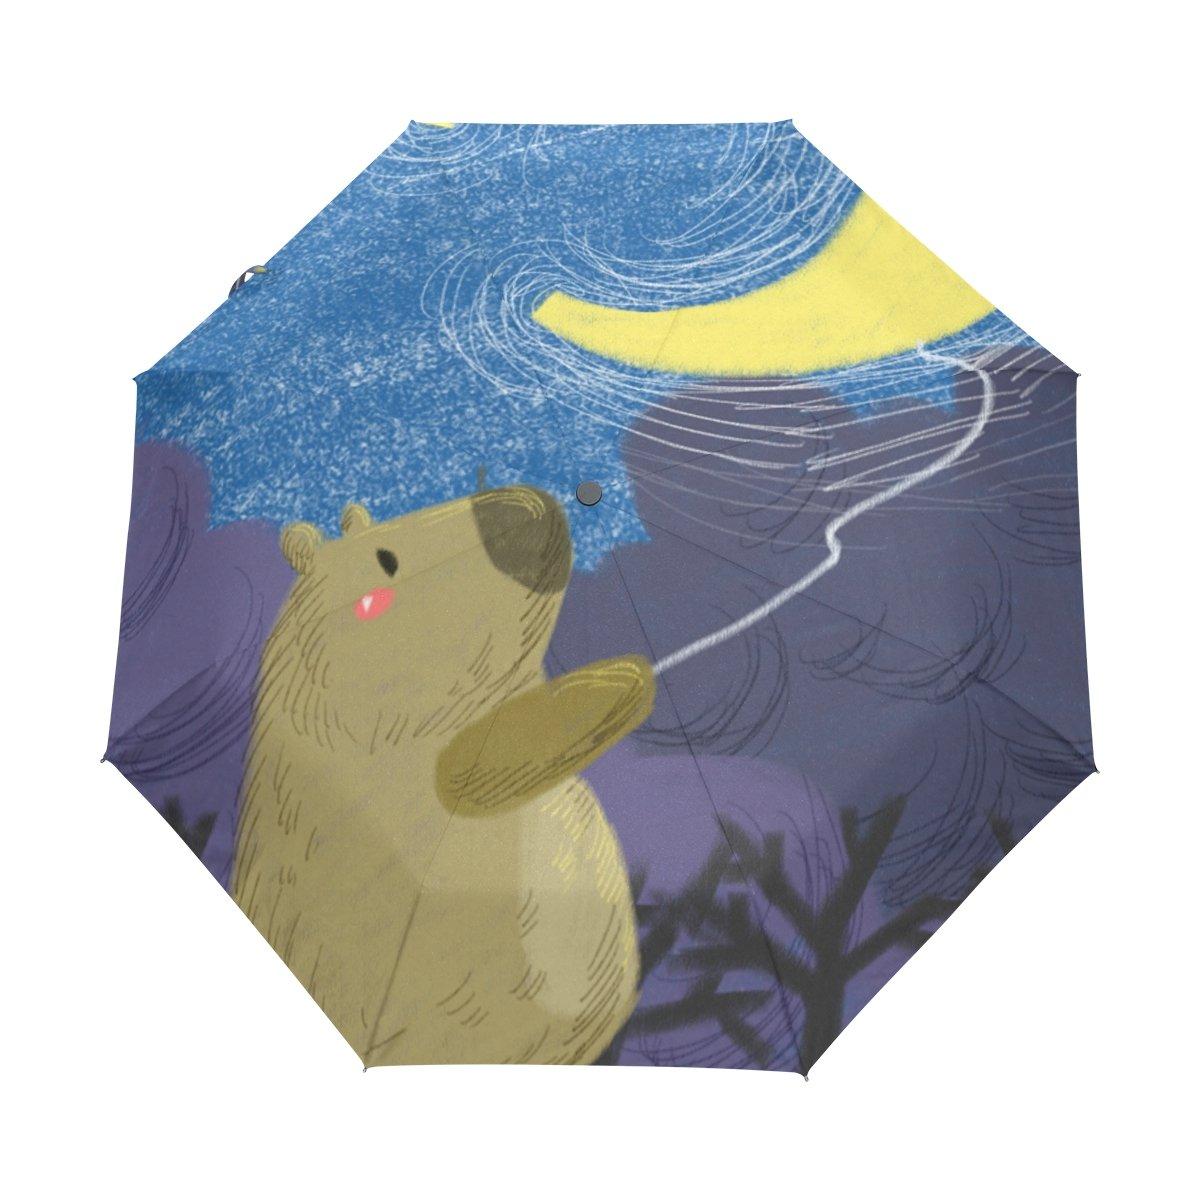 Senya Saobao防風と防雨トラベル傘with自動開いて閉じFolding Bear and Moonポータブル折りたたみ式太陽雨傘 B07FFNTY3S